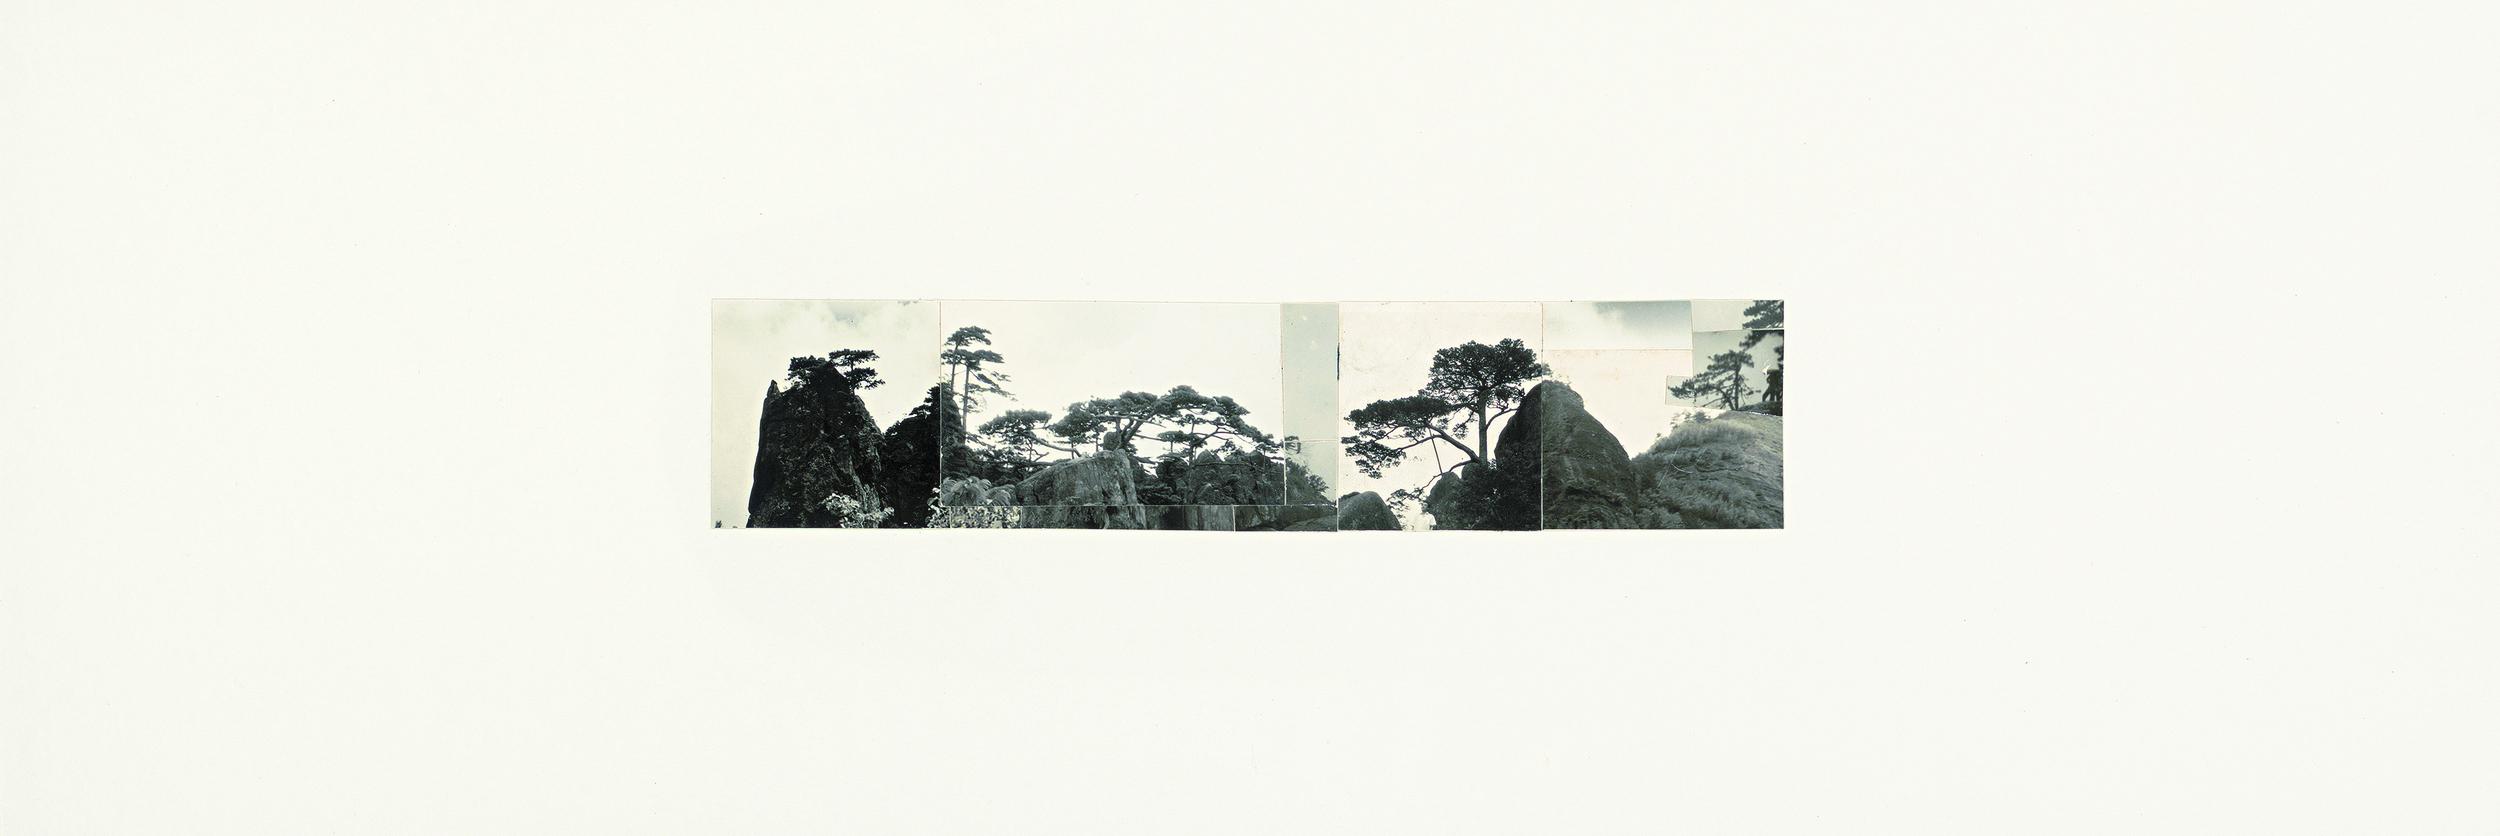 Ni Youyu 倪有鱼, Freewheeling Trip ⅠV 逍遥游 4, 2011 - 2012, Collage 拼贴, 20 × 60 cm